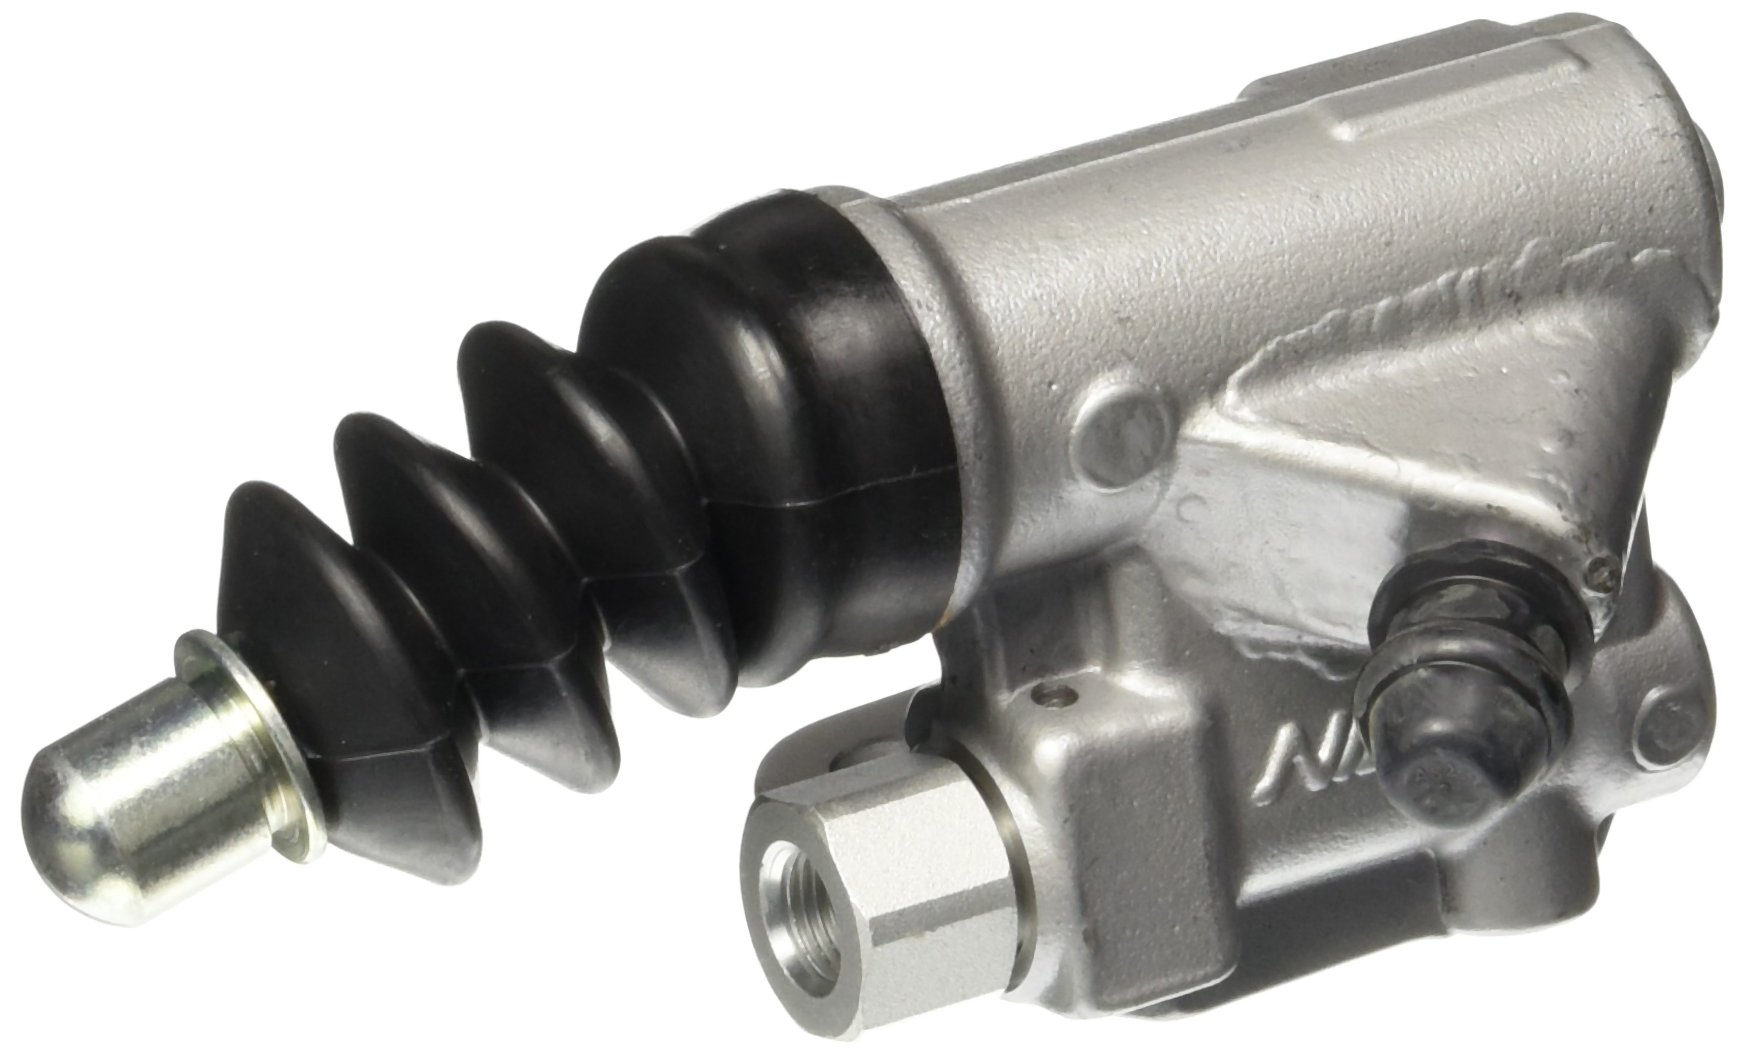 Genuine Honda 46930-SDP-A01 Clutch Slave Cylinder Assembly